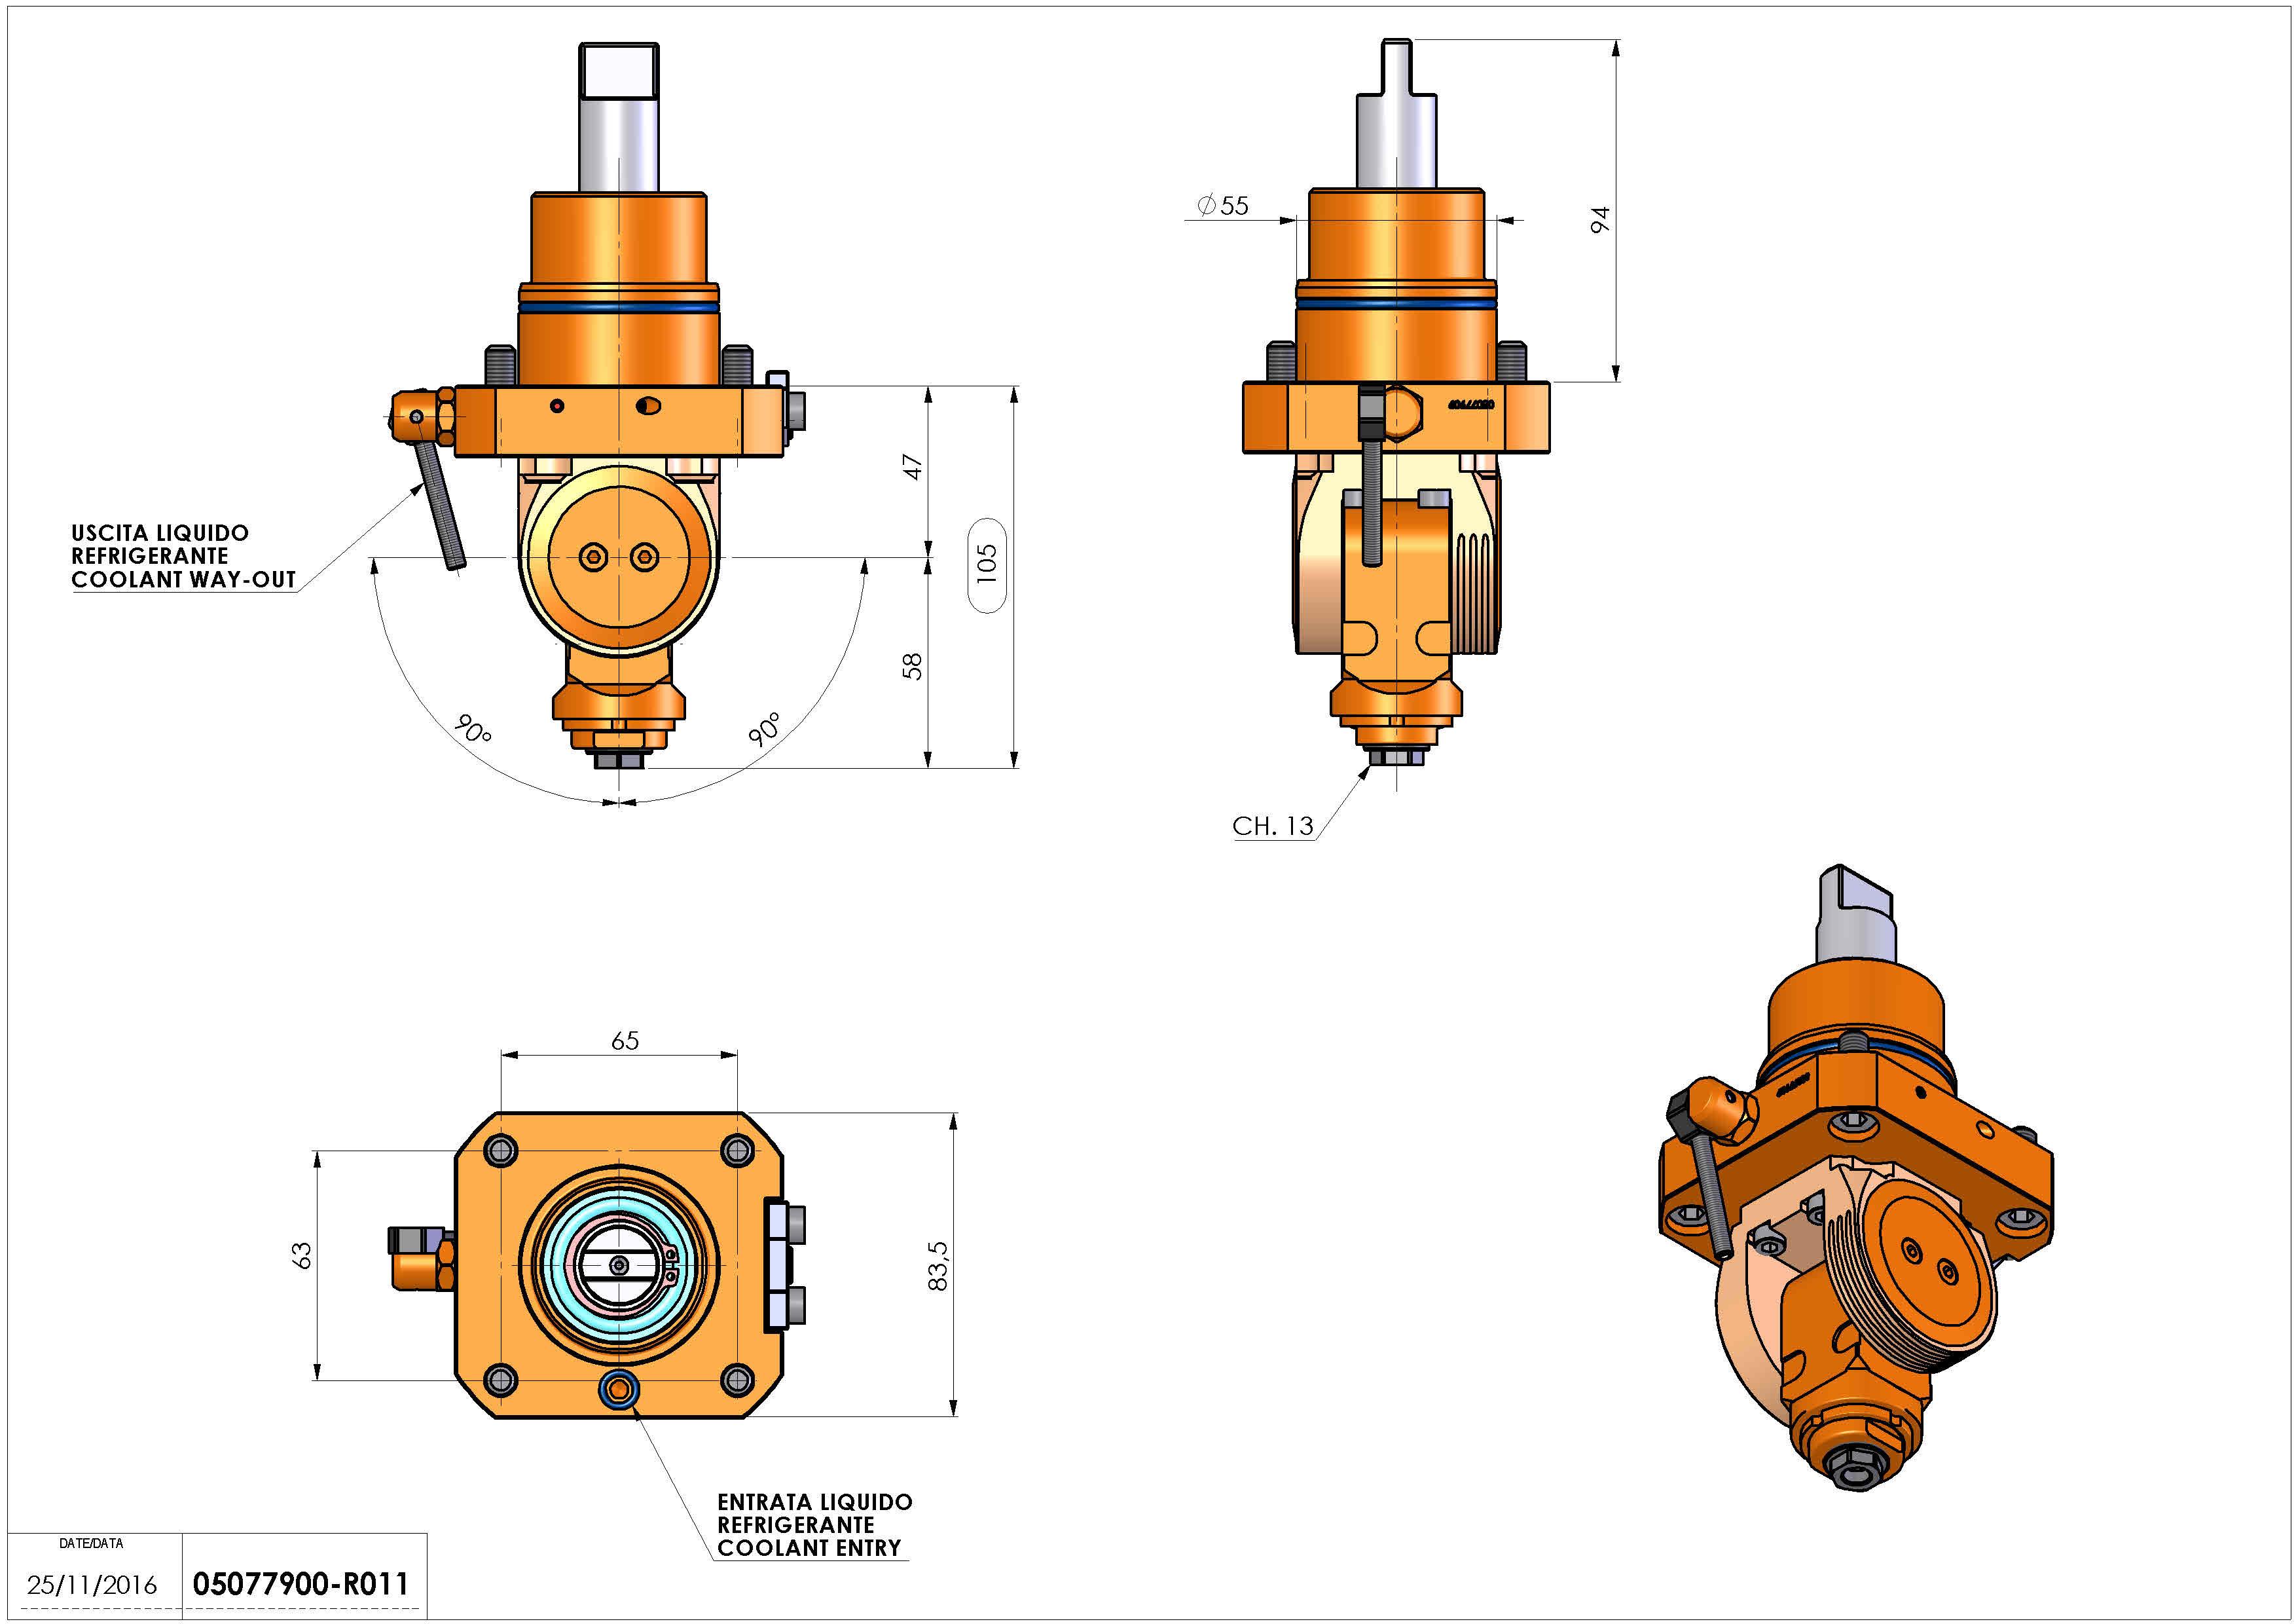 Technical image - LT-T D55 ER11F H44-102 BI.